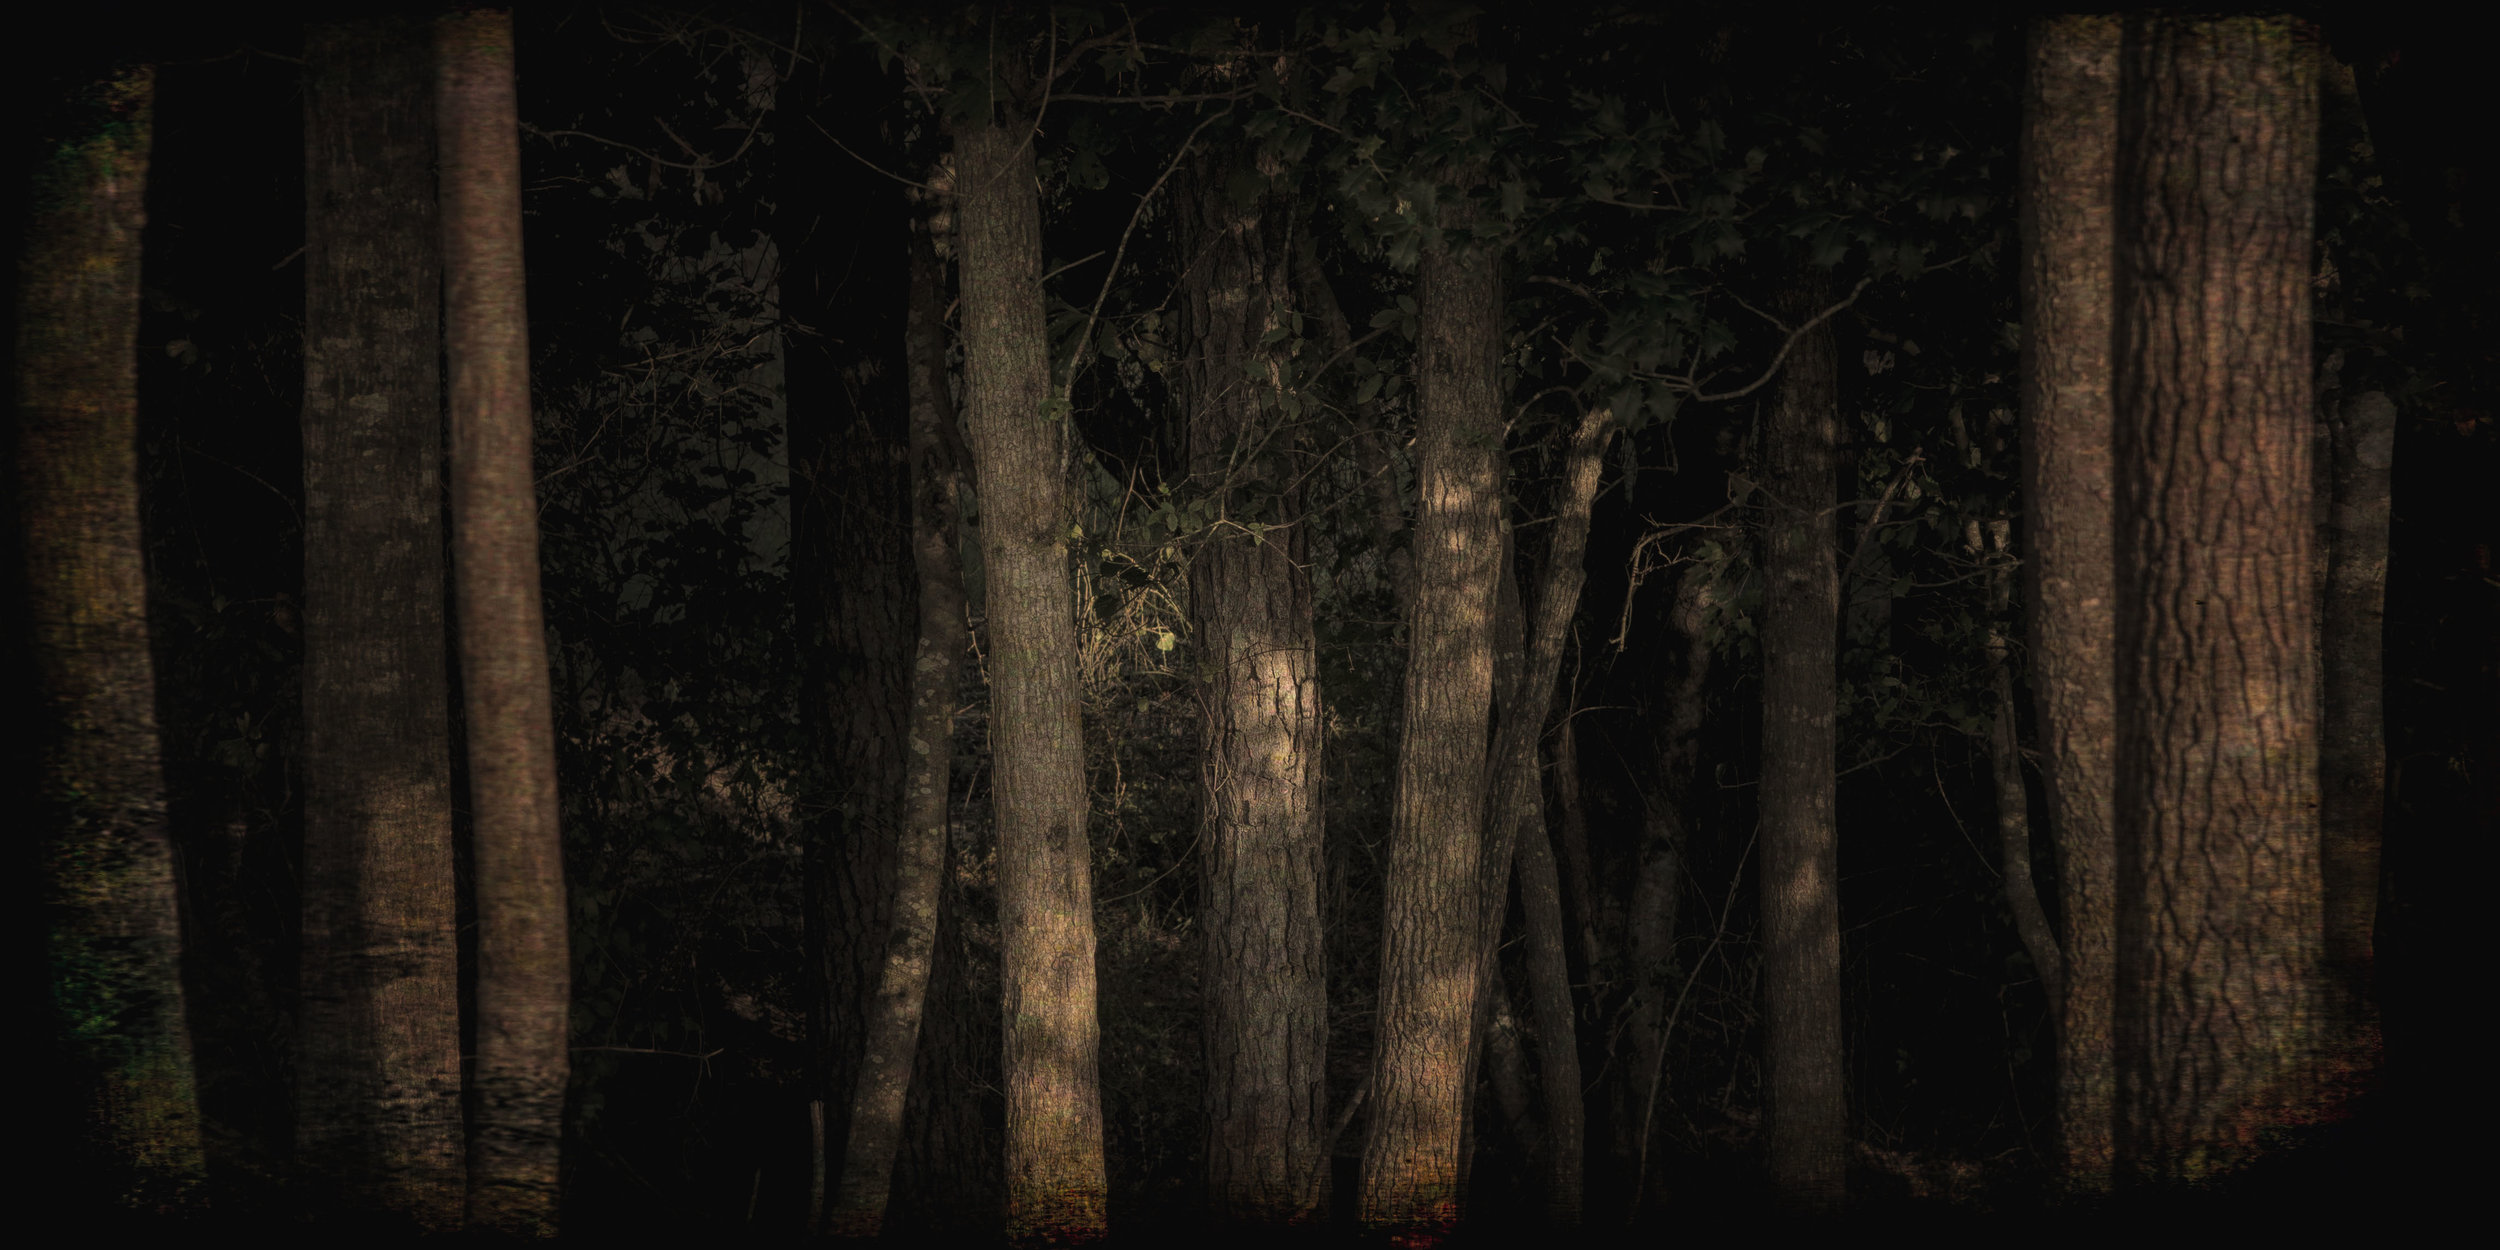 FSCR Trees 20180726 067 v3.jpg